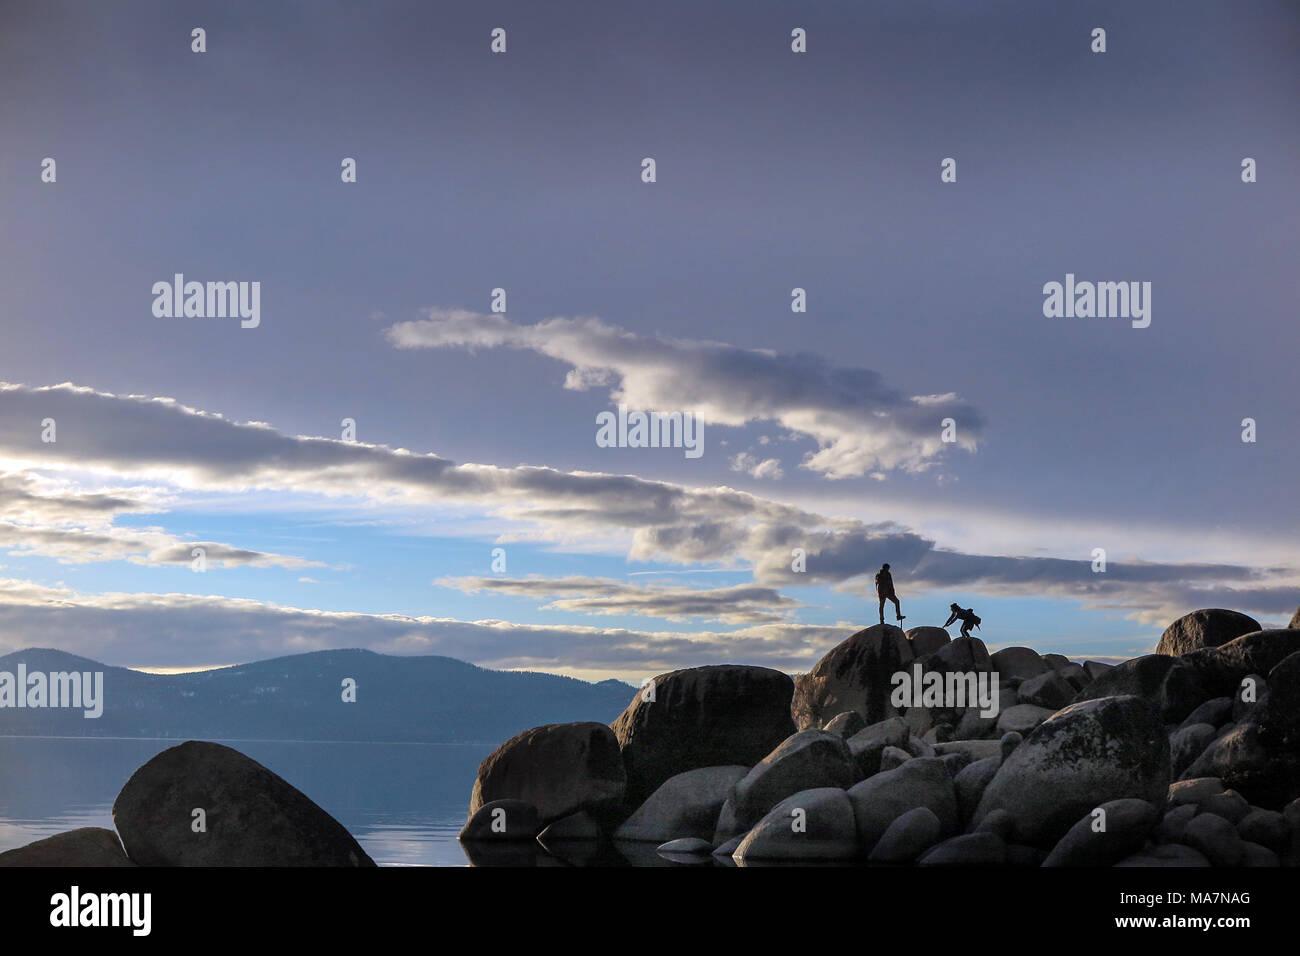 Silhouettes of two people walking on rocks at Lake Tahoe USA - Stock Image